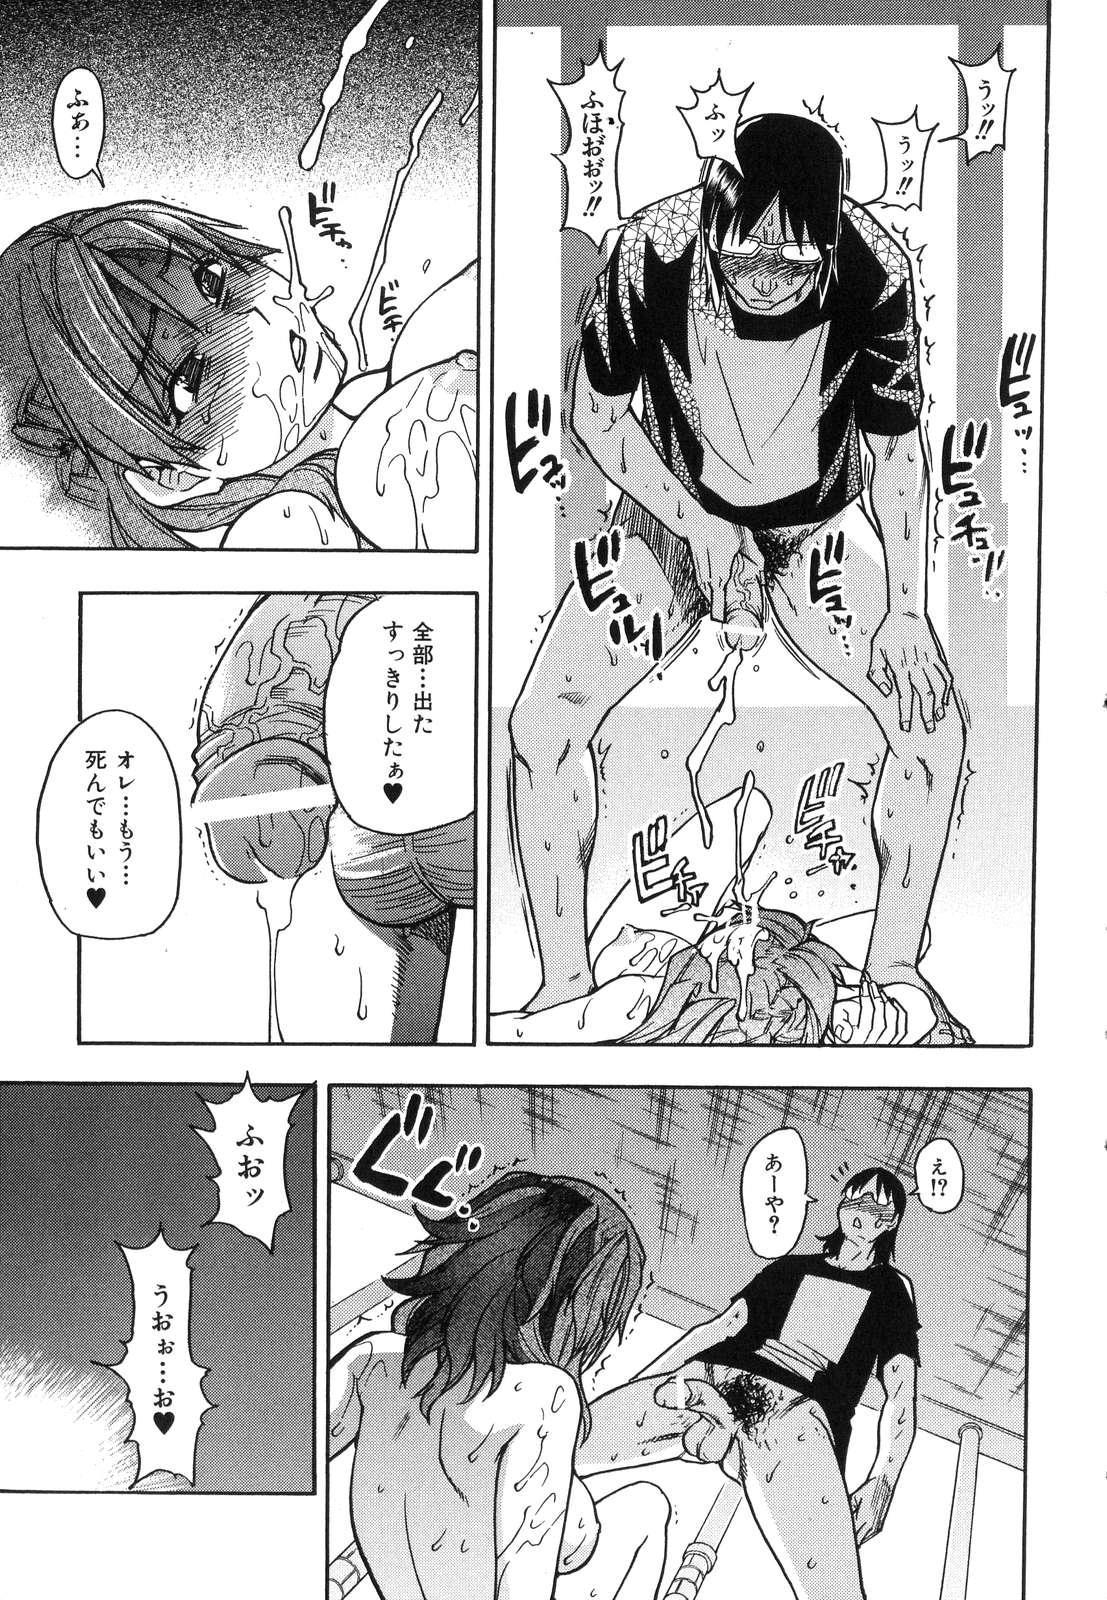 Shining Musume. 6. Rainbow Six 140